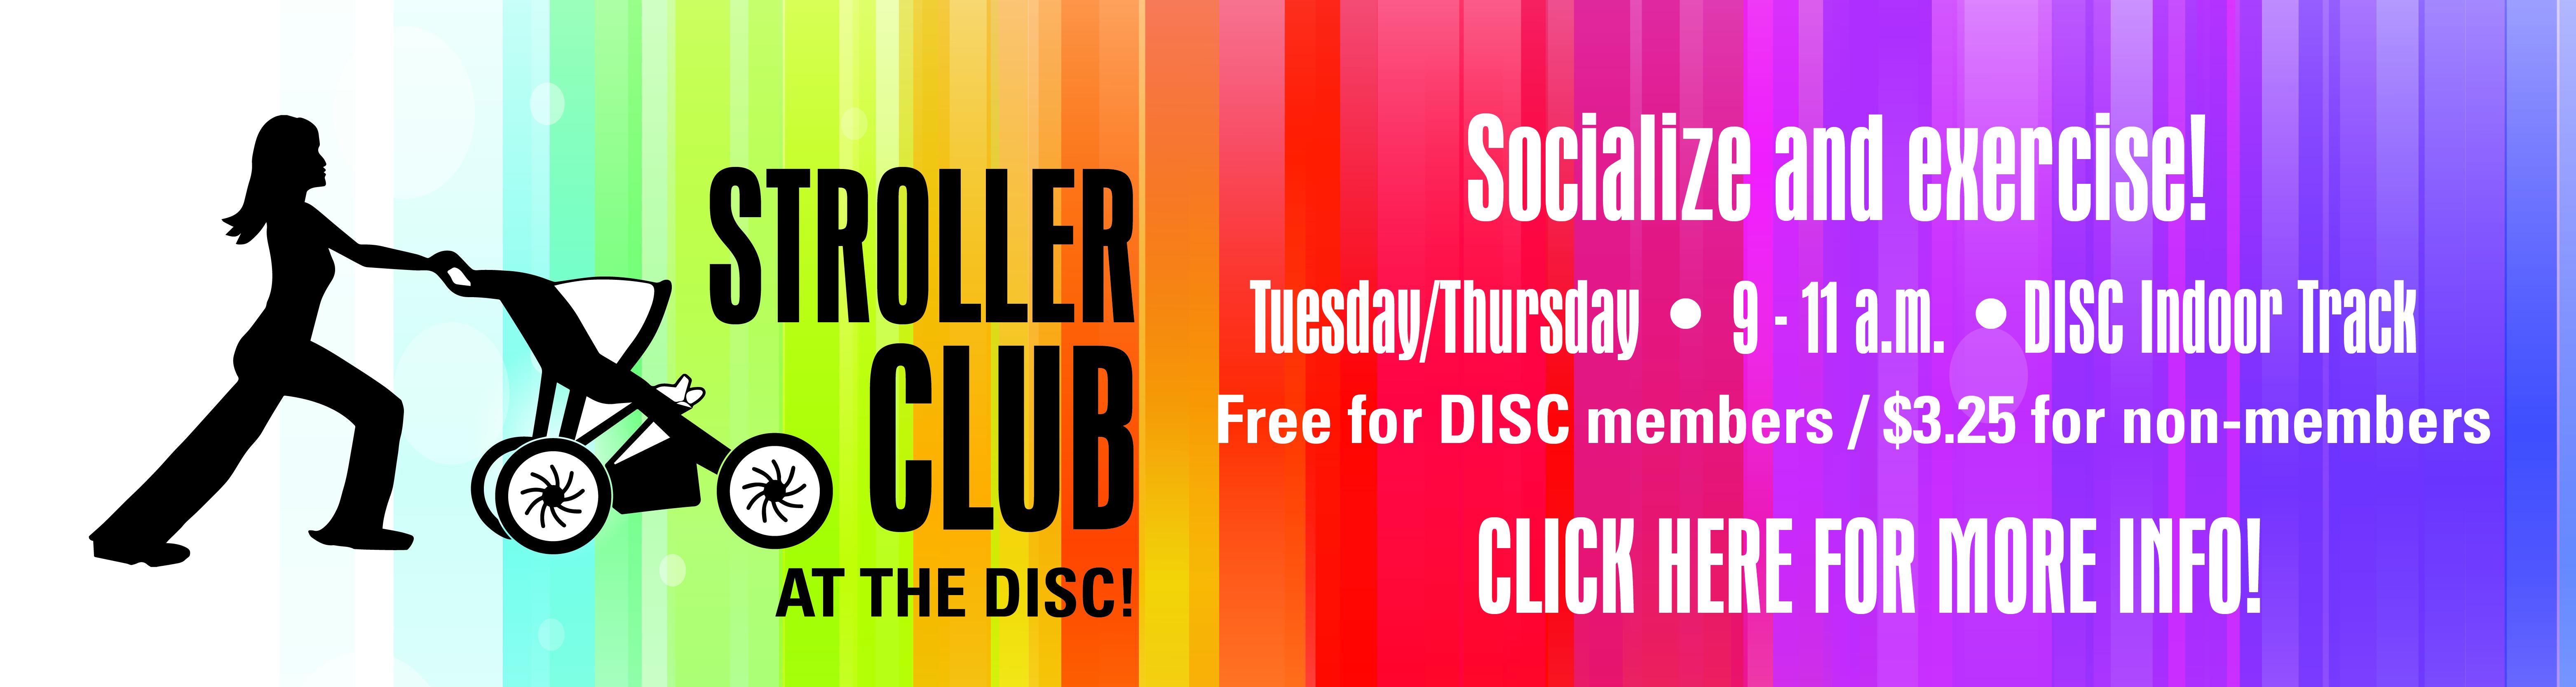 StrollerClub_Slider